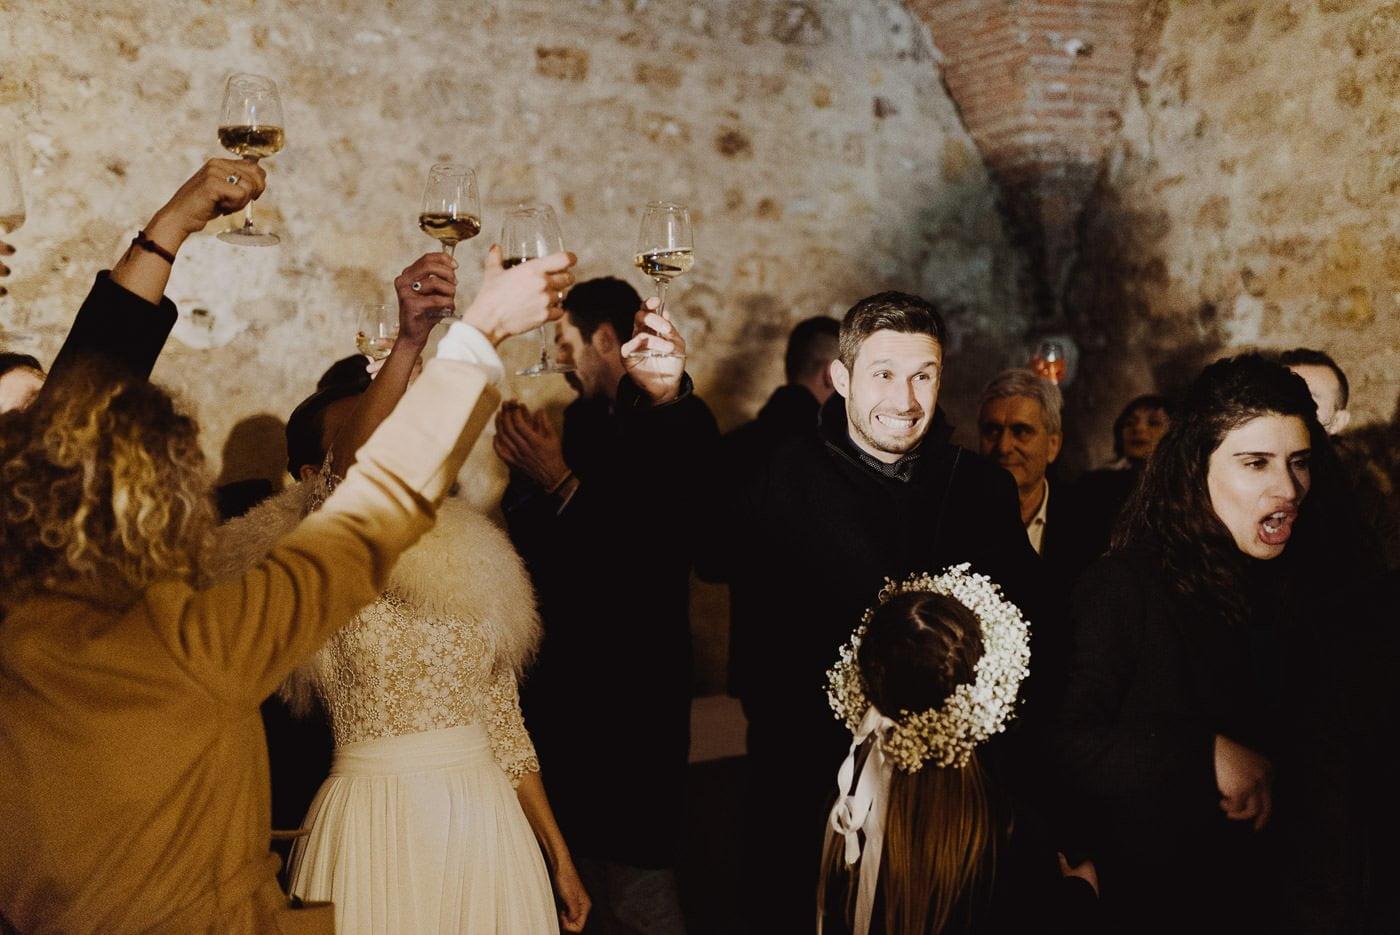 Matrimonio Giulia & Alessandro 28_12 – Alessio Nobili Photographer-51